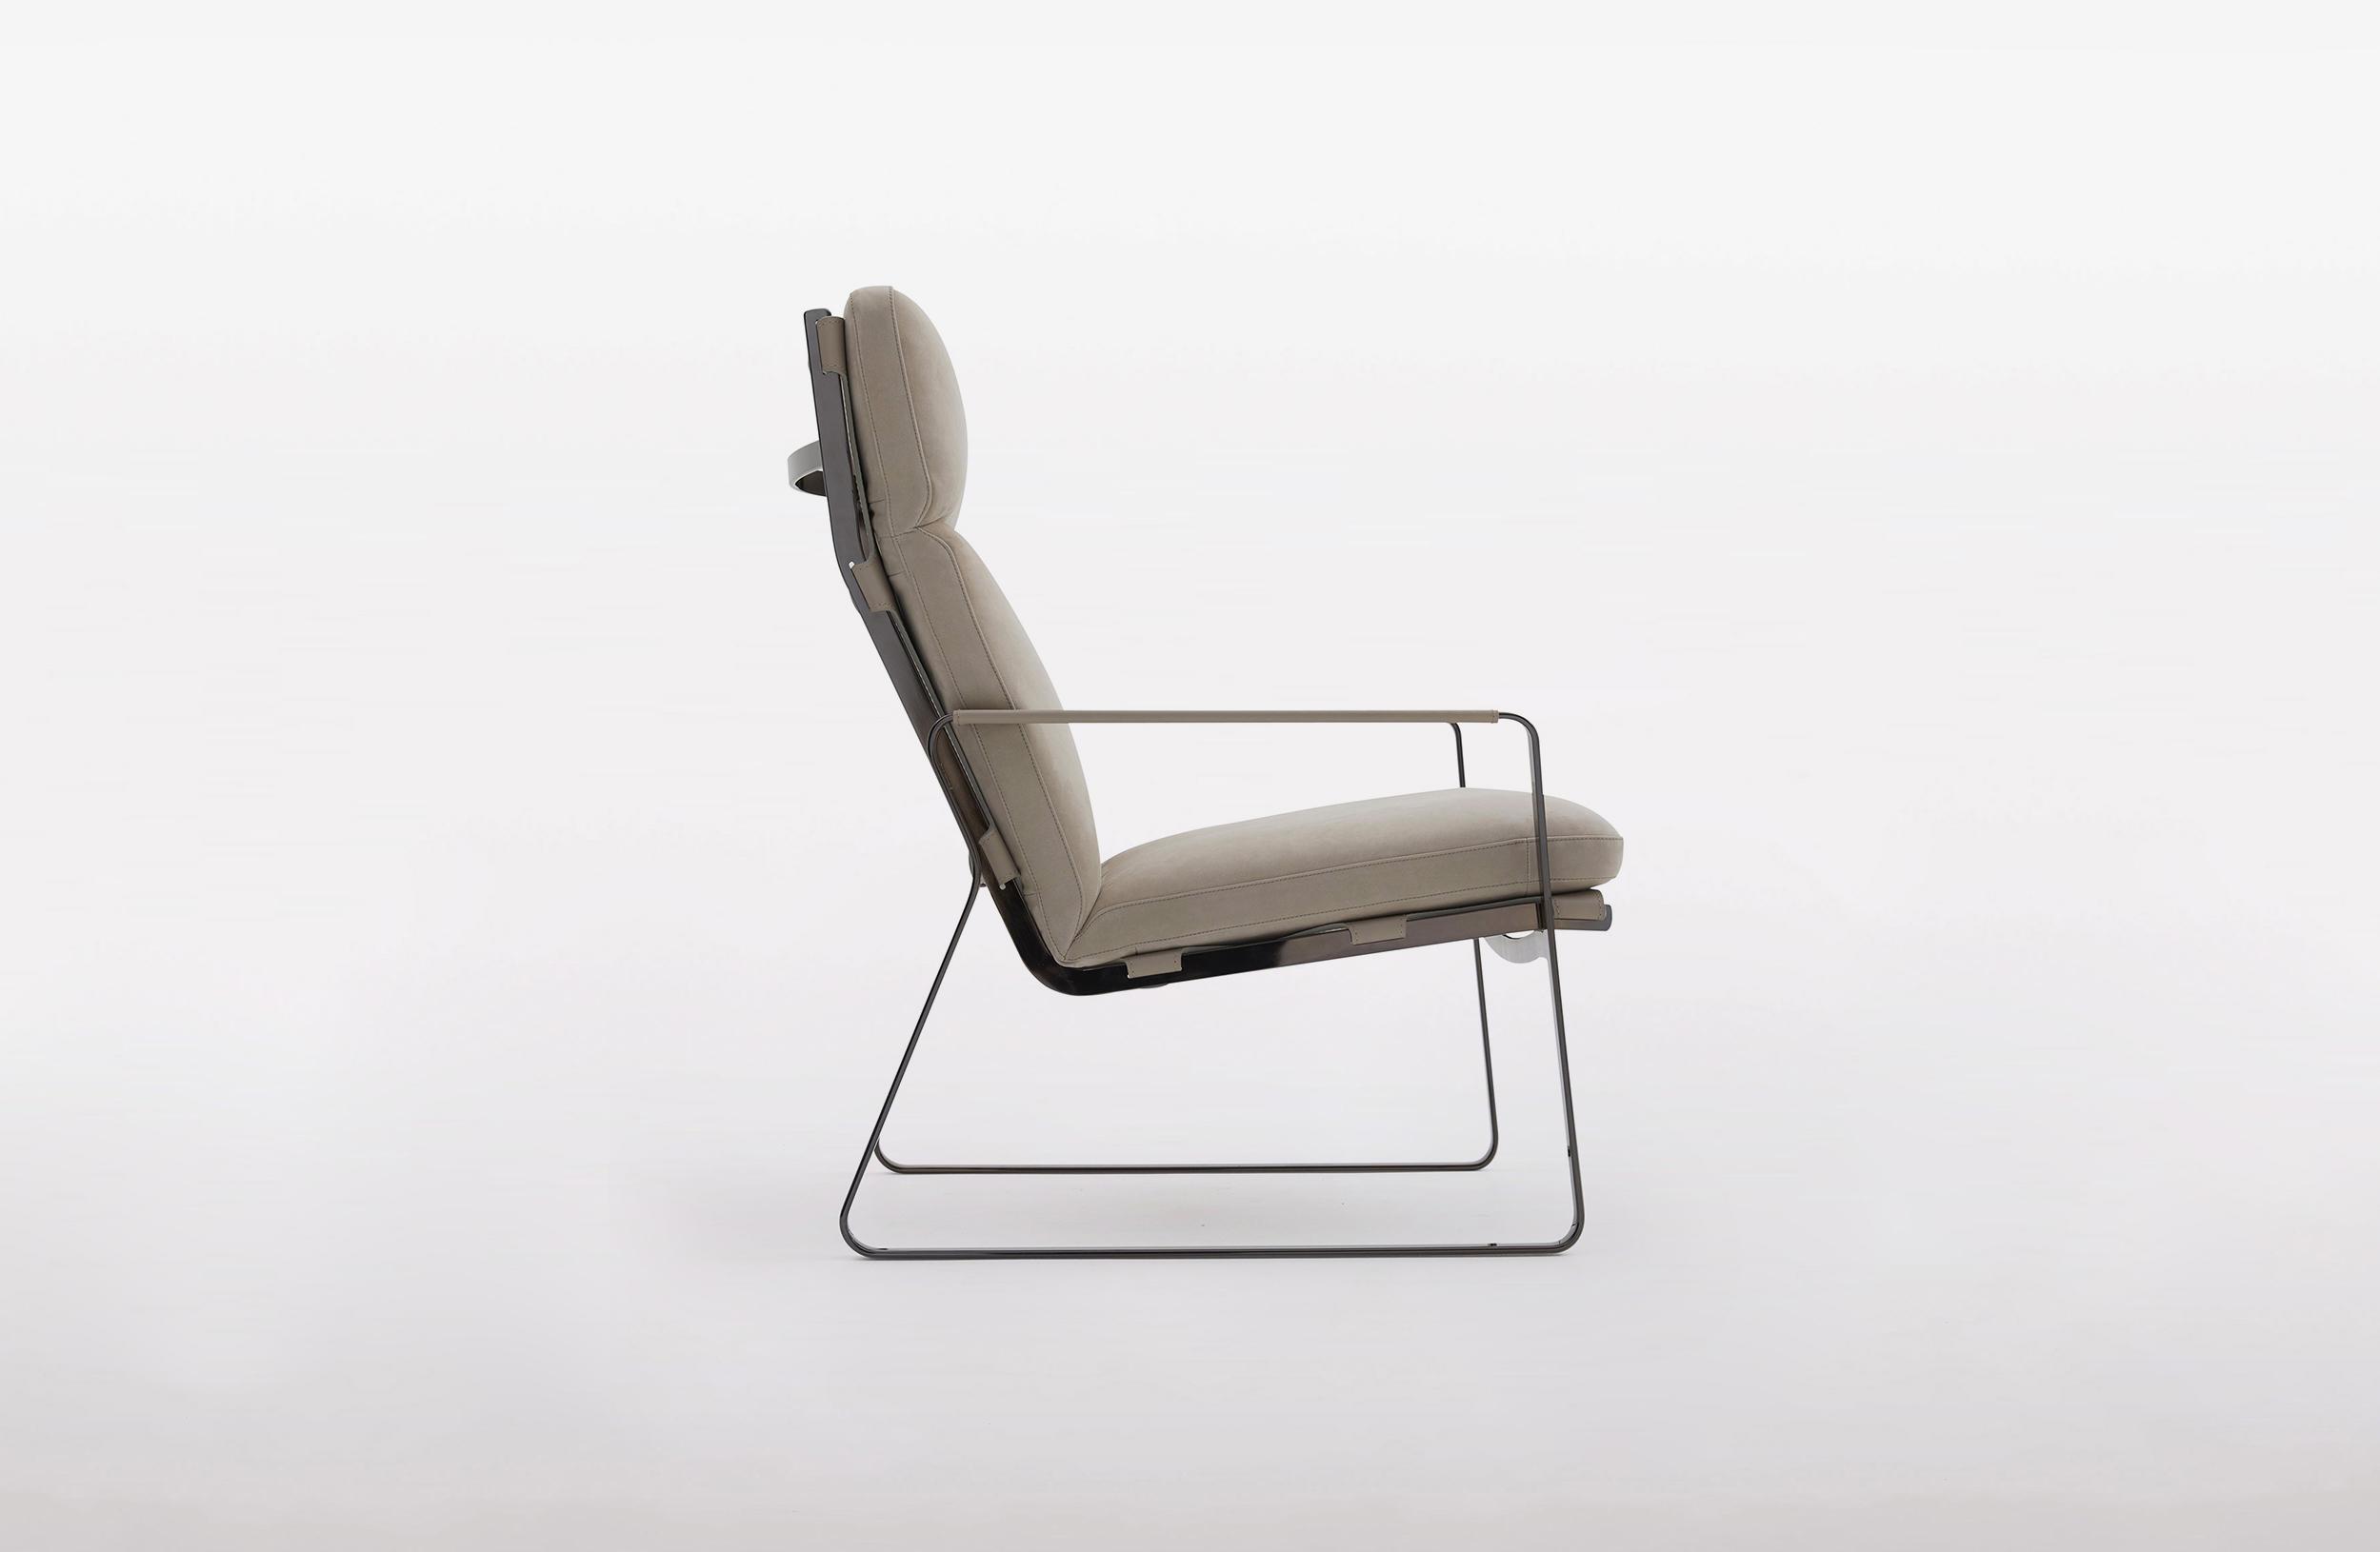 fendi_casa-blixen_armchair-02